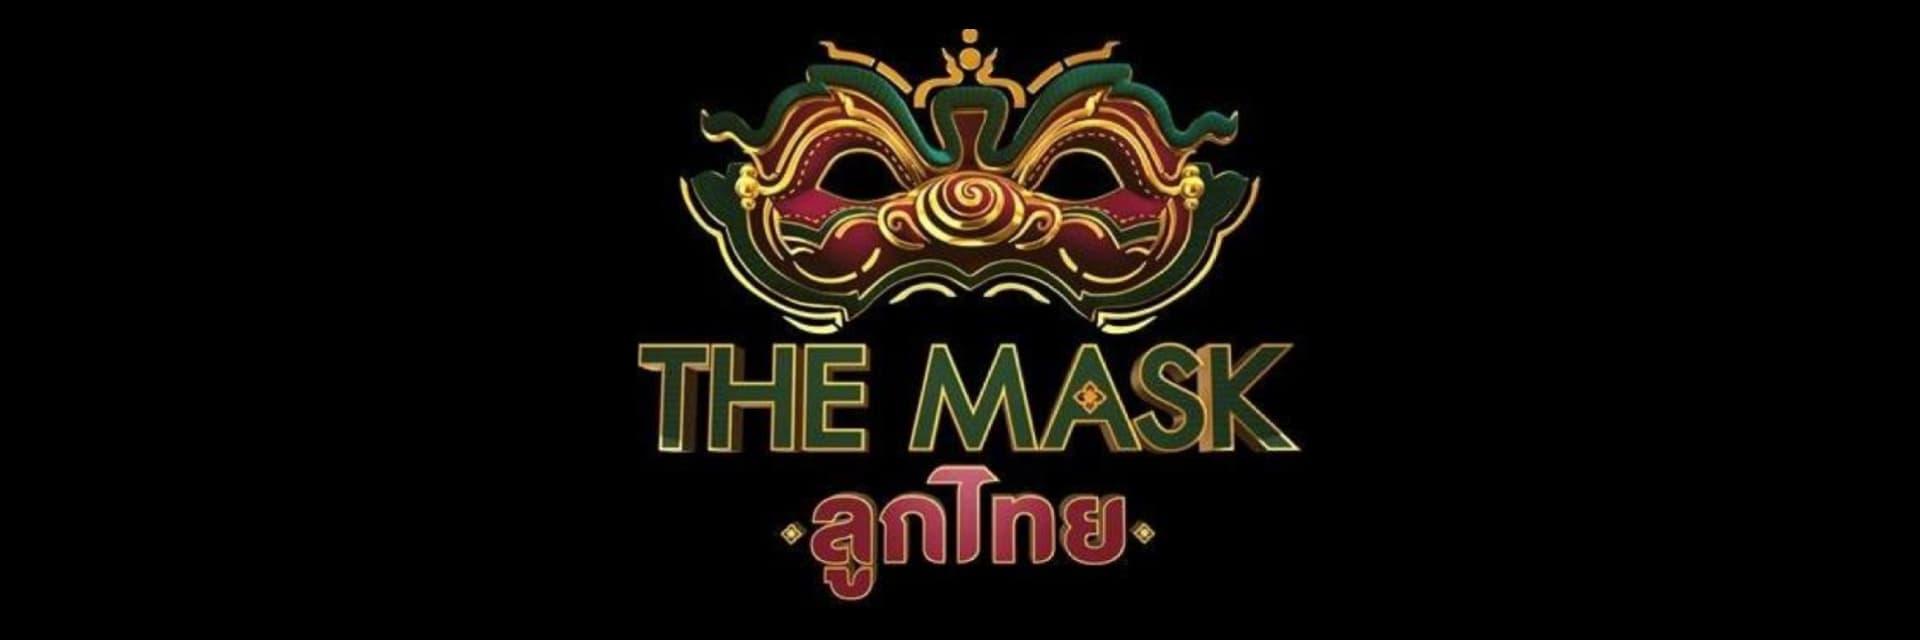 The Mask ลูกไทย